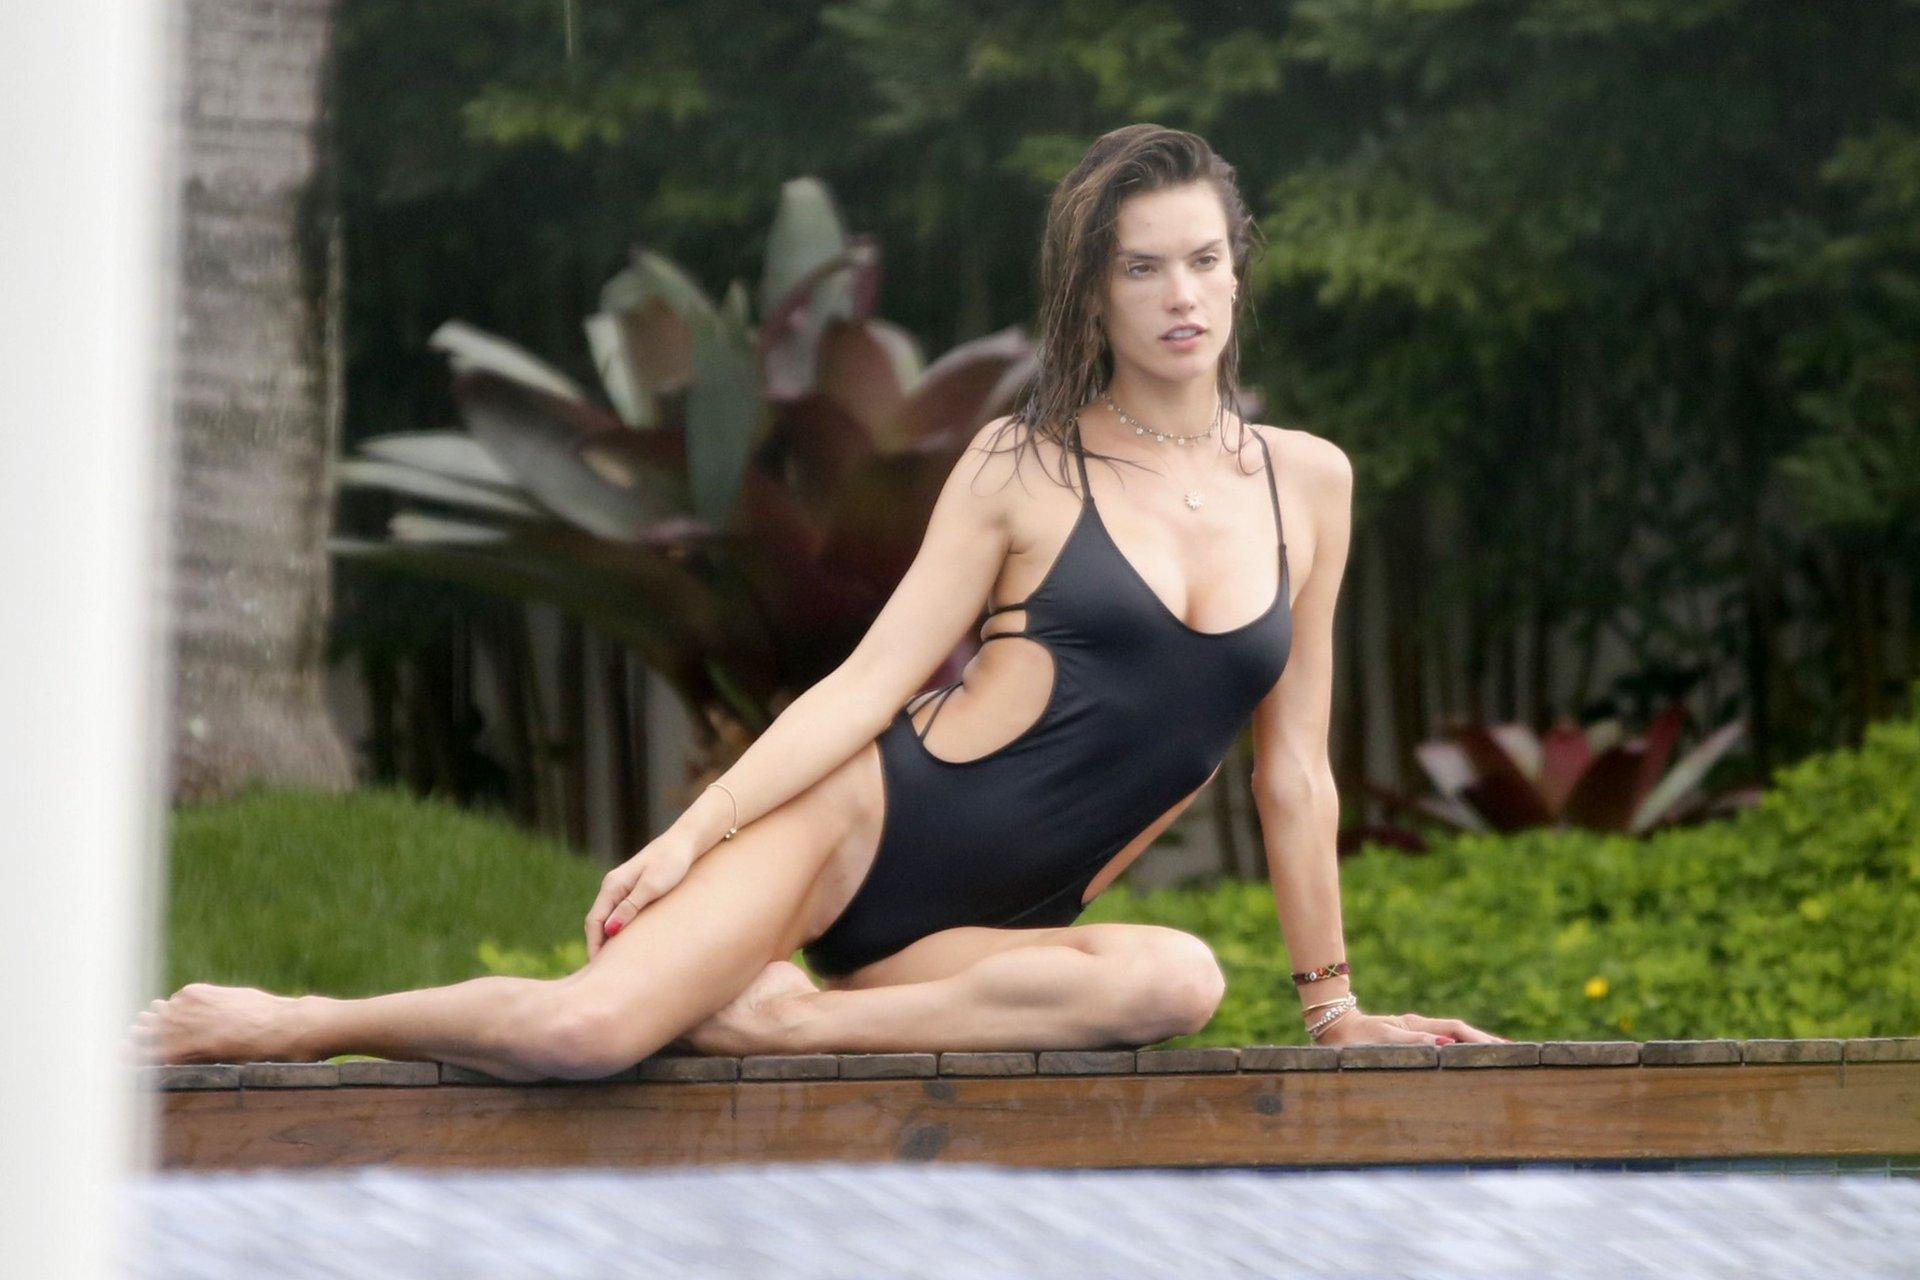 Watch Alessandra ambrosio sexy topless 47 Photos video